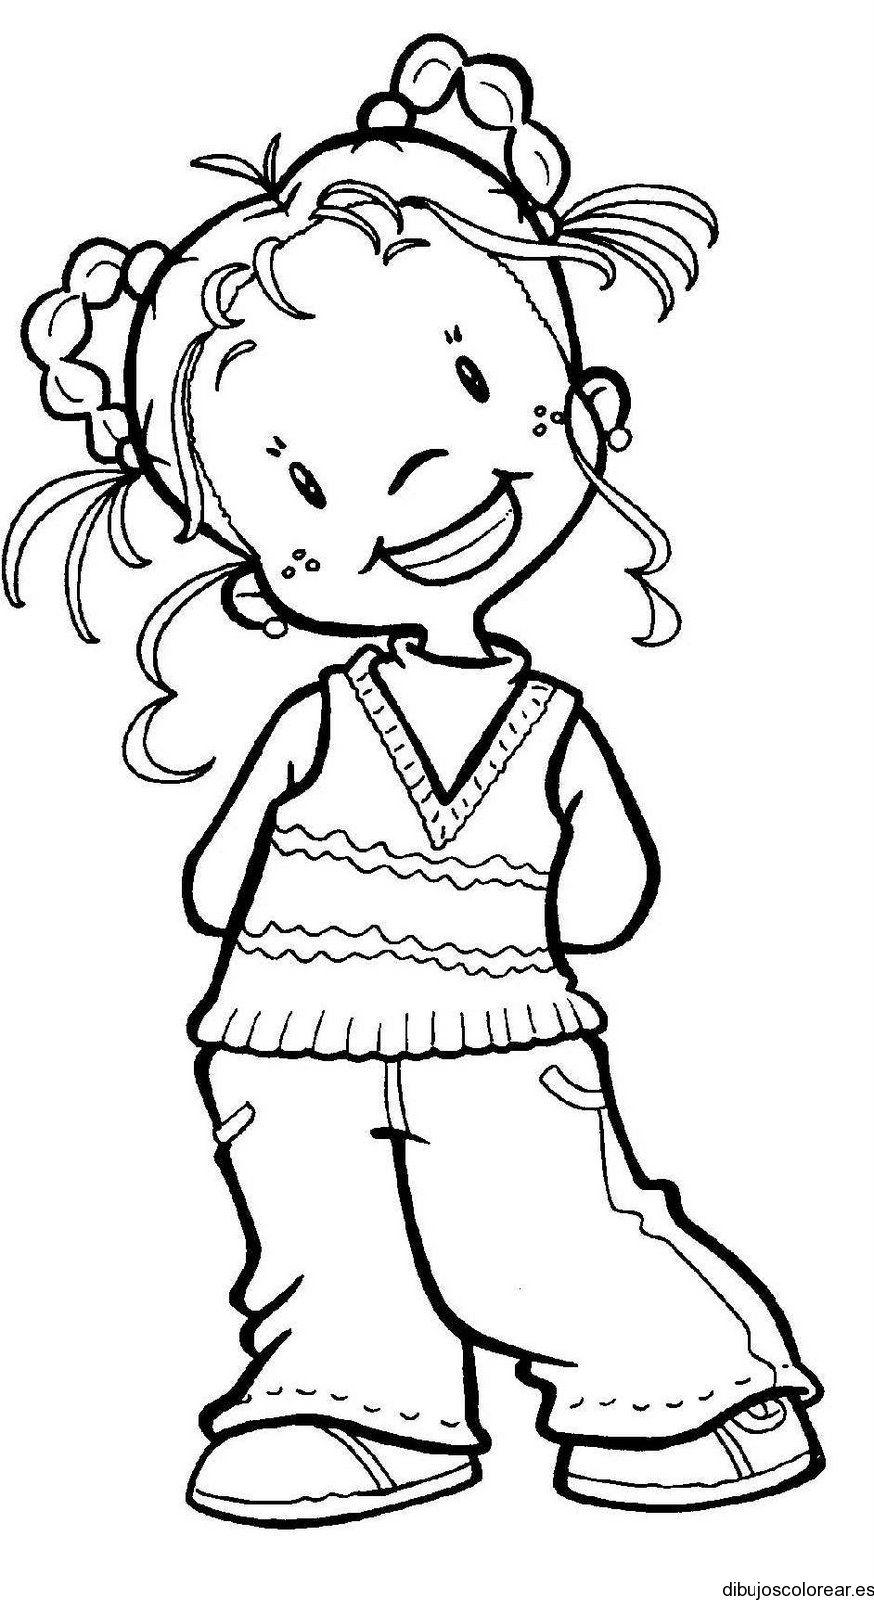 dibujos niñas - Buscar con Google | DIBUJITOS Y COLOREO | Pinterest ...